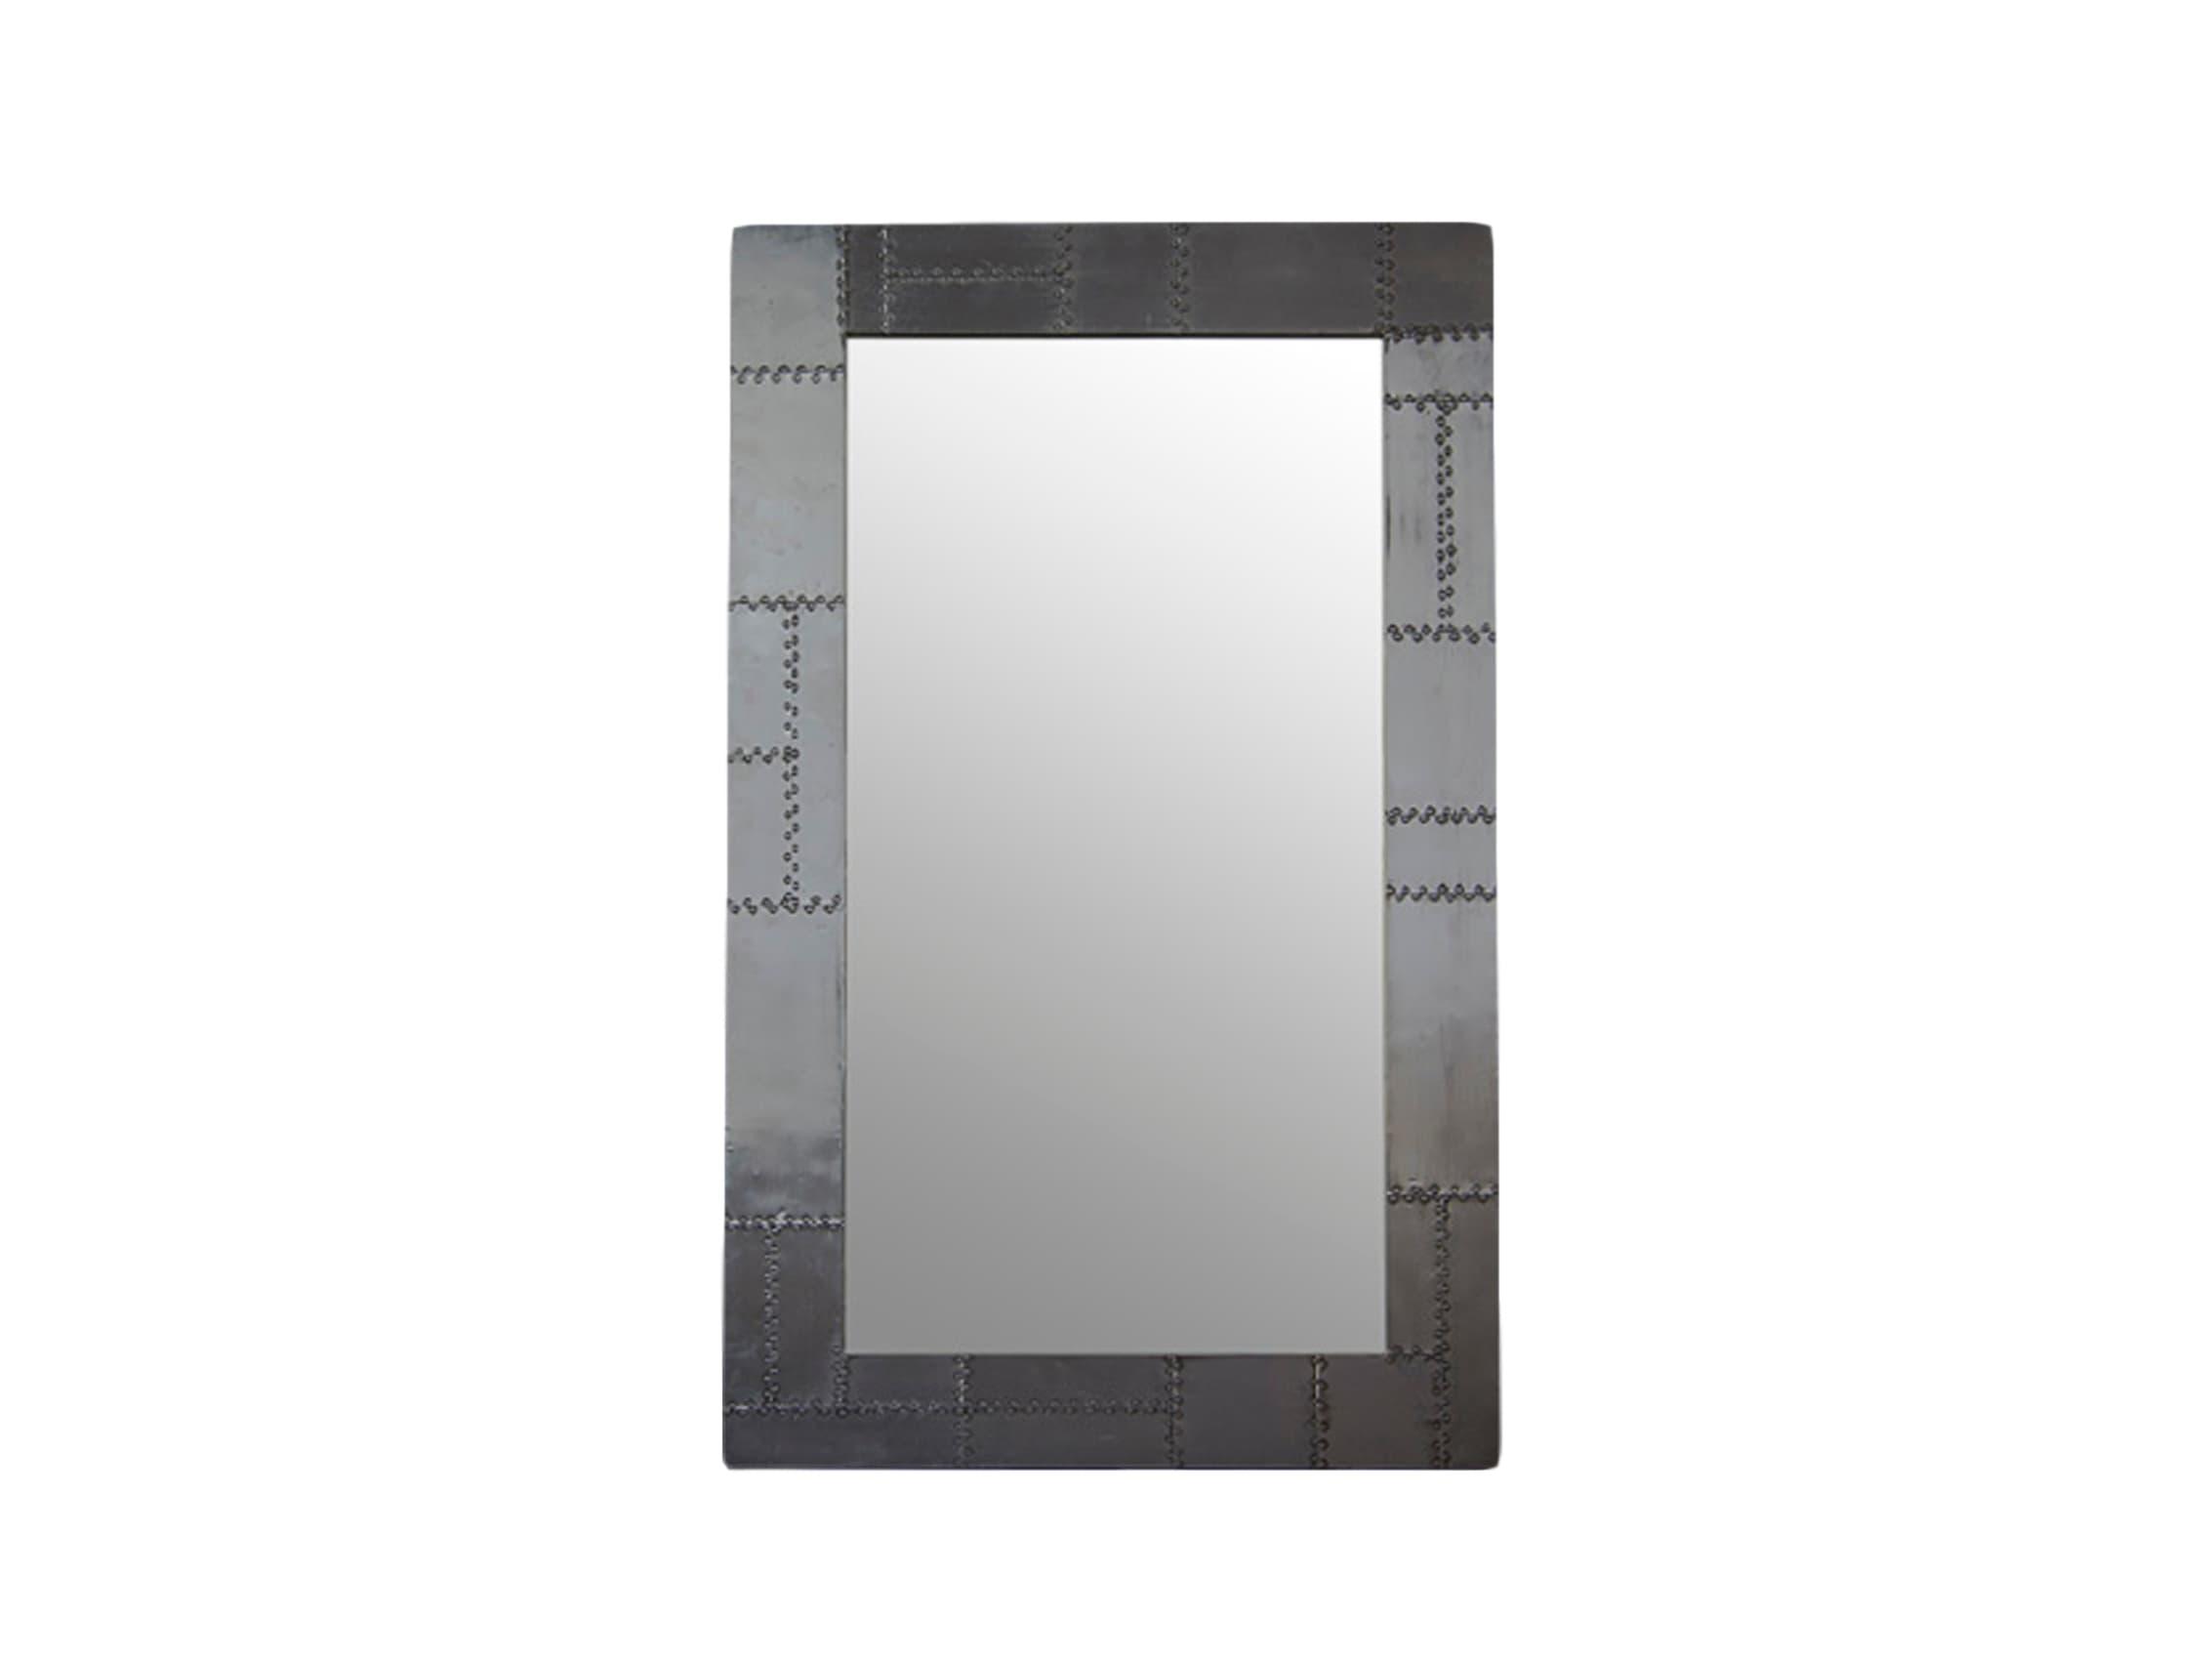 ЗеркалоНастенные зеркала<br>Зеркало в раме из дерева махагони, декорированной металлом.<br><br>Material: Металл<br>Width см: 100<br>Depth см: 3<br>Height см: 165